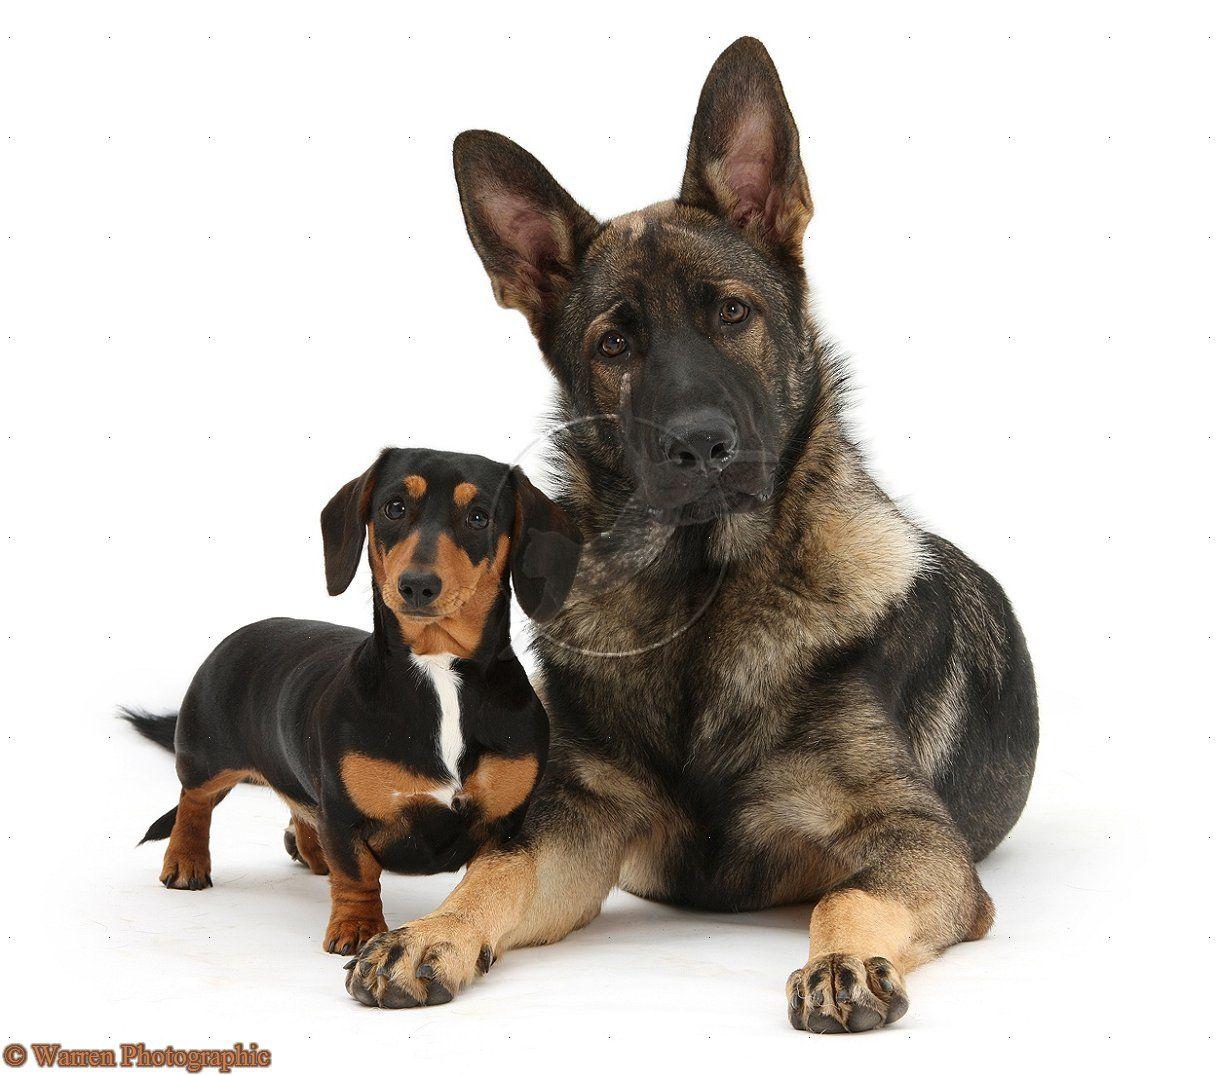 German shepherd and dachshund | German Shepherds: The #1 ...